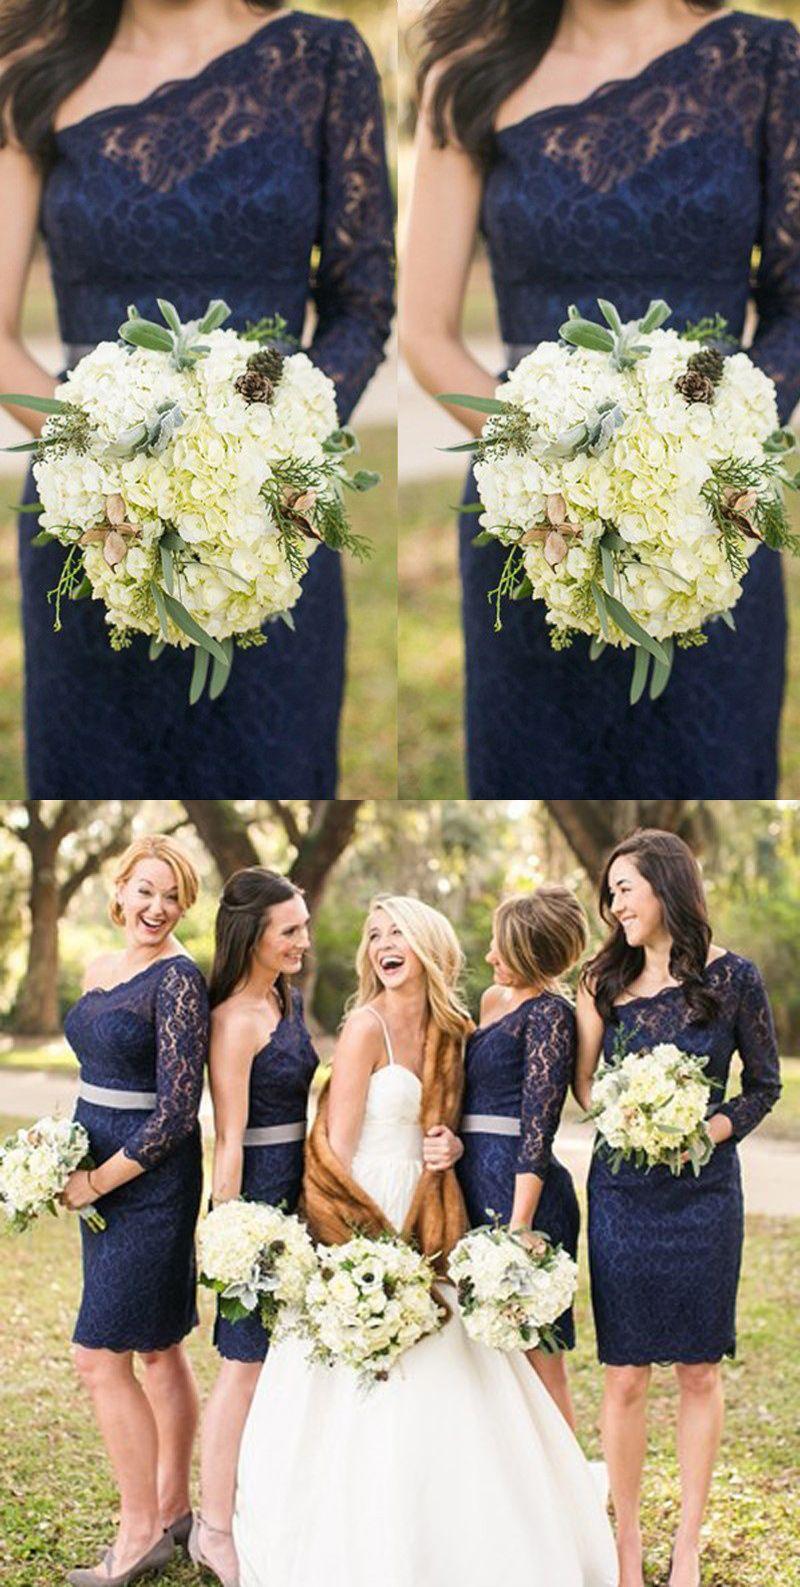 Elegant One Shoulder Short Navy Blue Lace Bridesmaid Dress with Sash ...